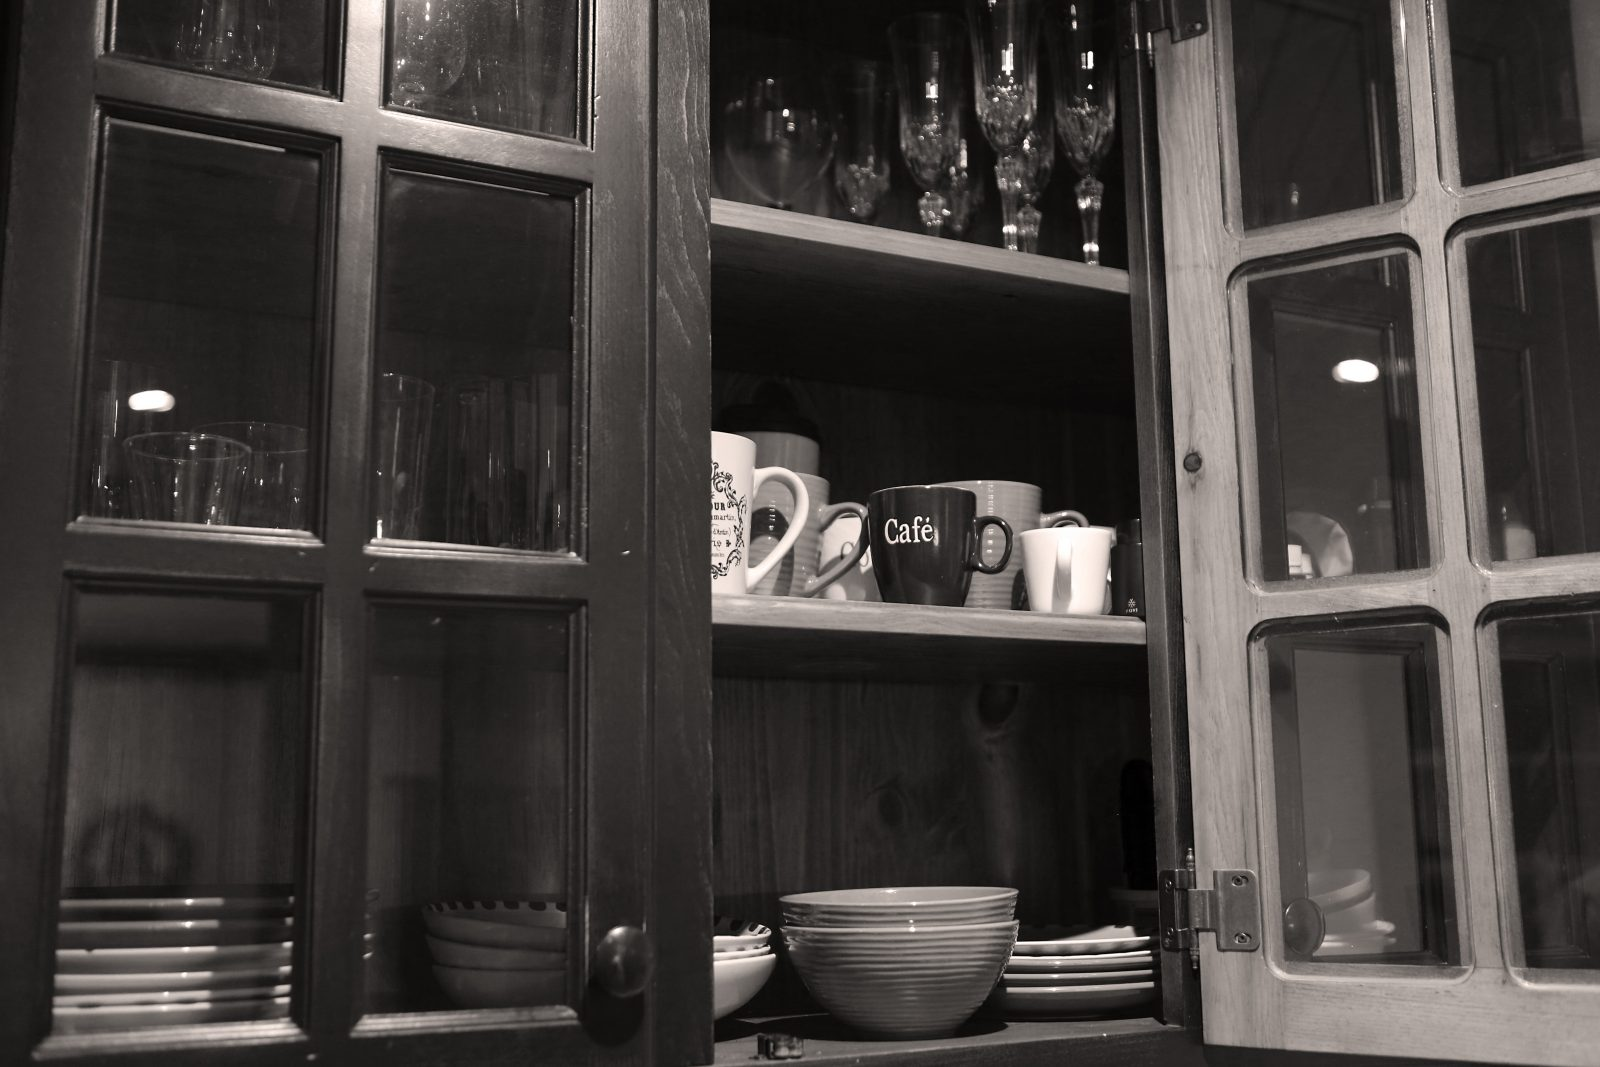 Welcoming Coffee Cabinet